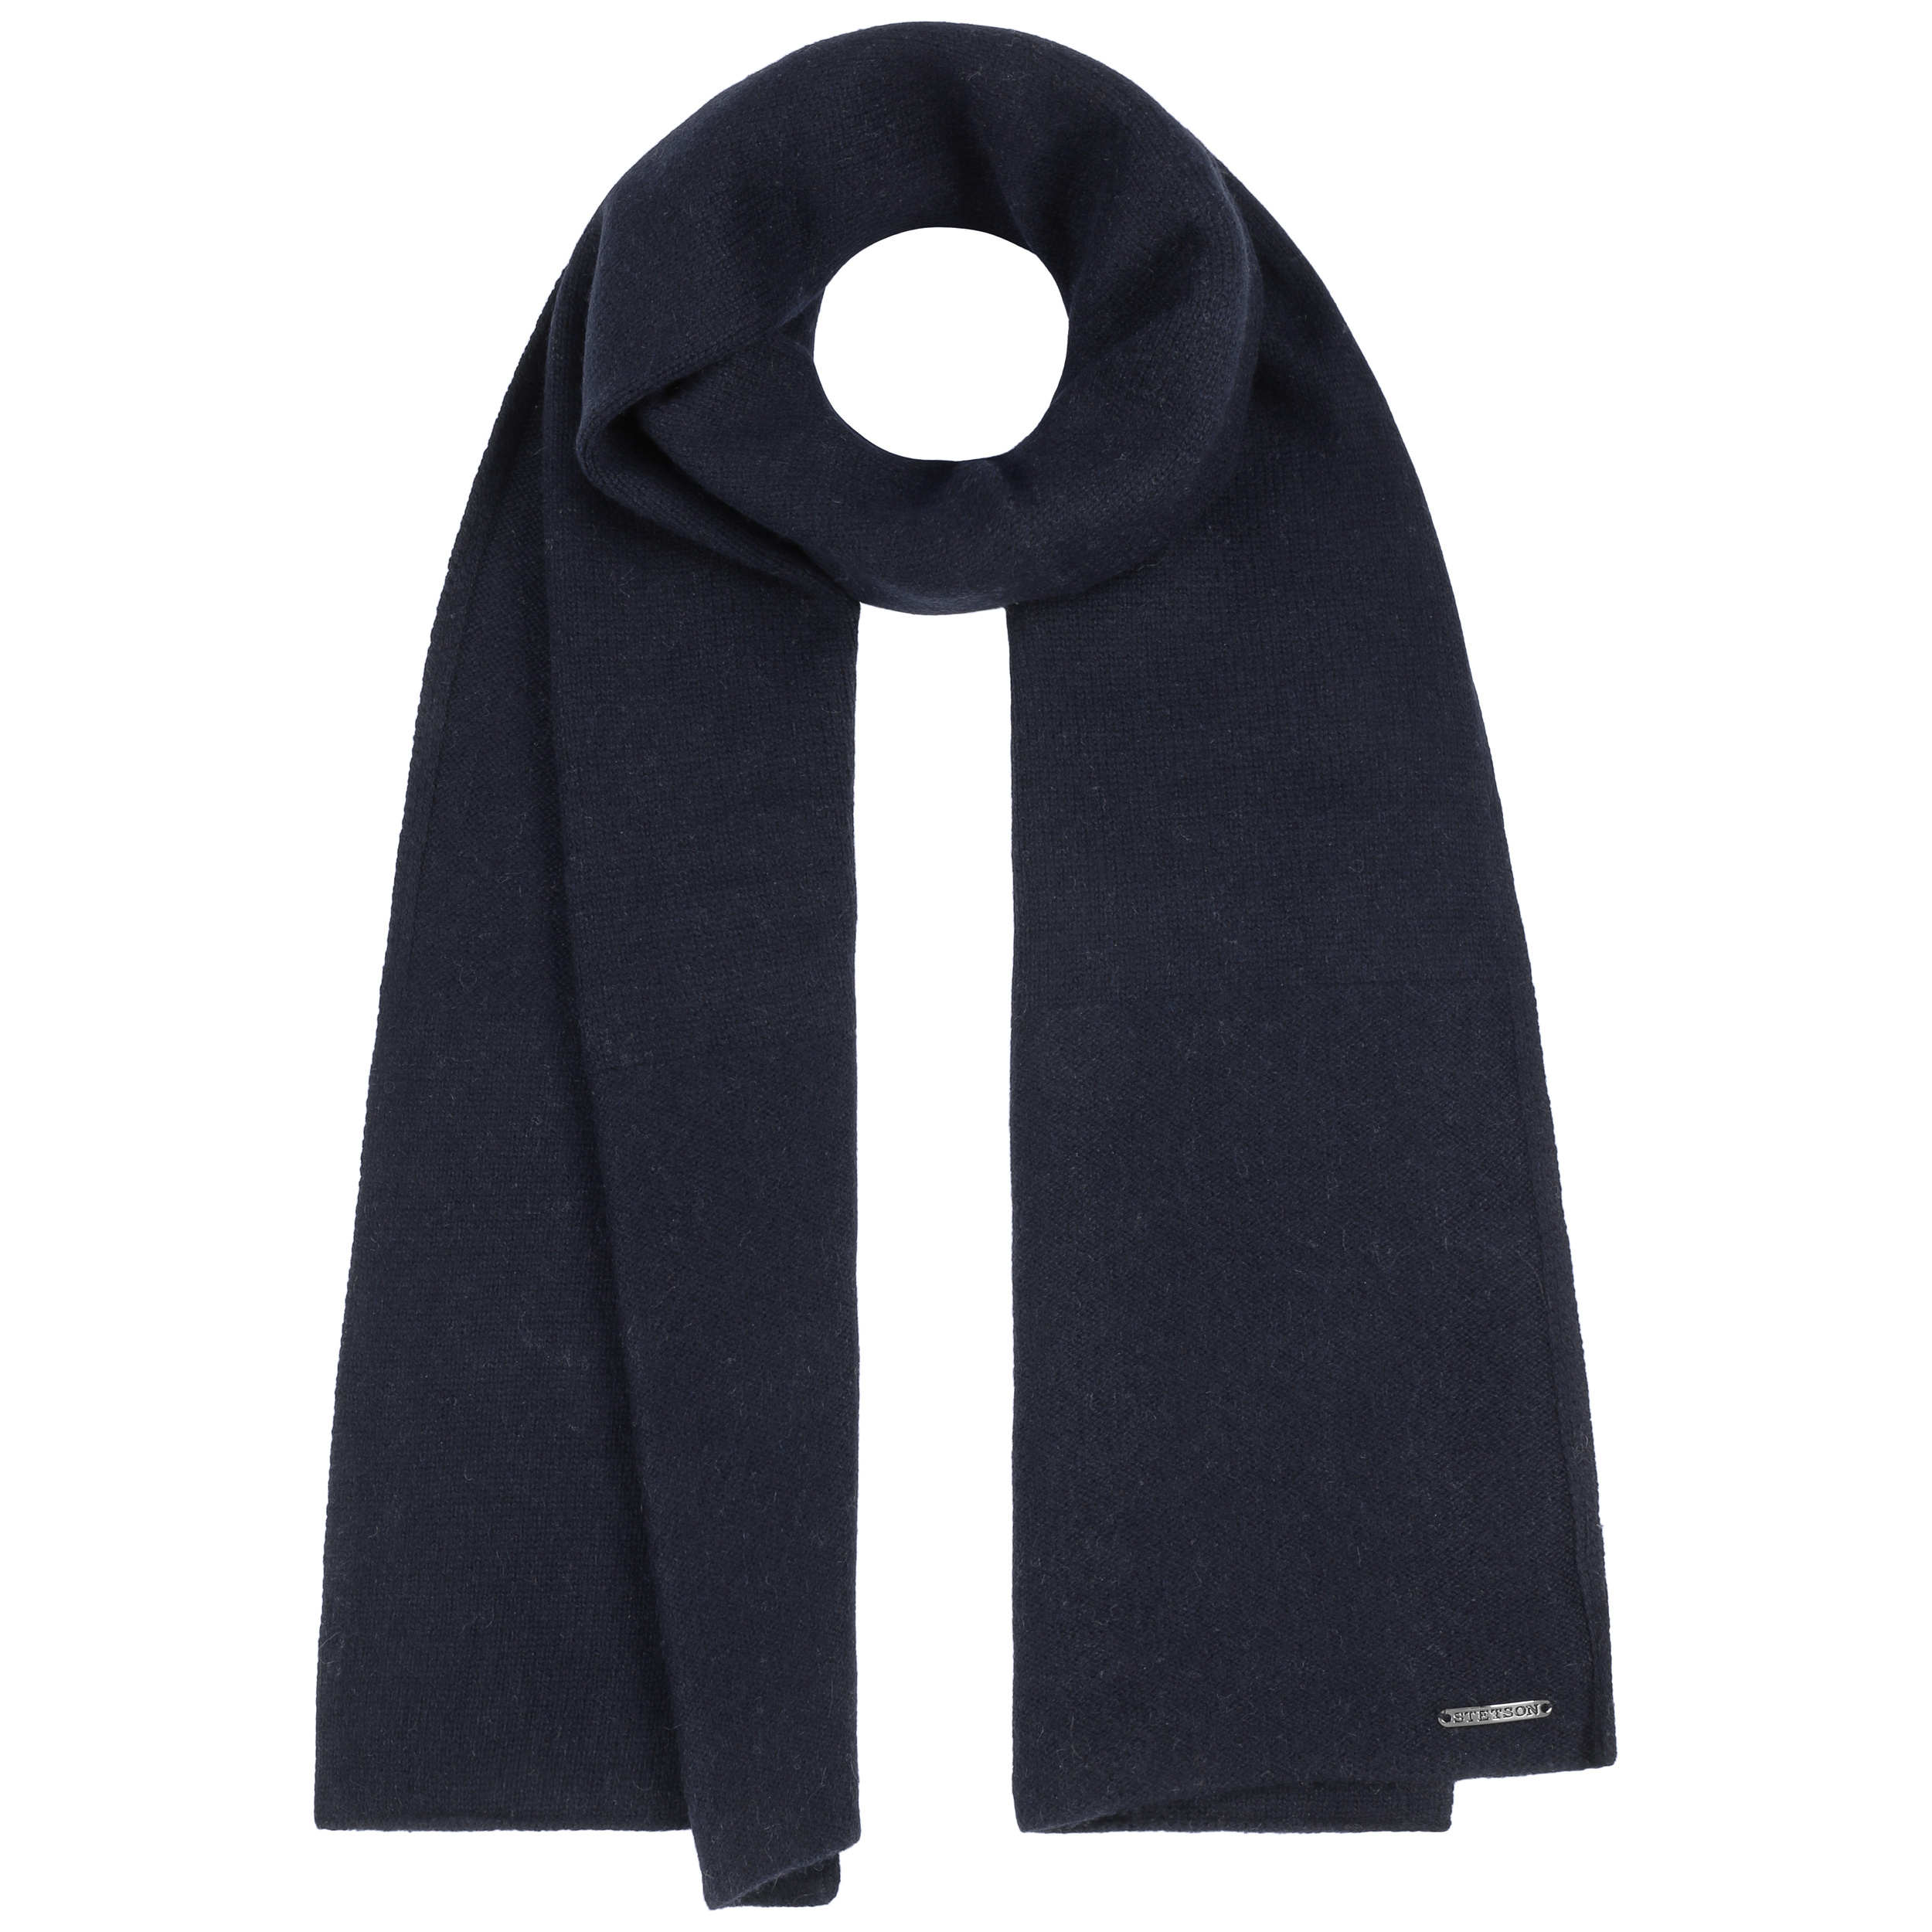 ... Sciarpa a Maglia Cashmere Wool by Stetson - blu scuro 2 ... e15bcac23a0f